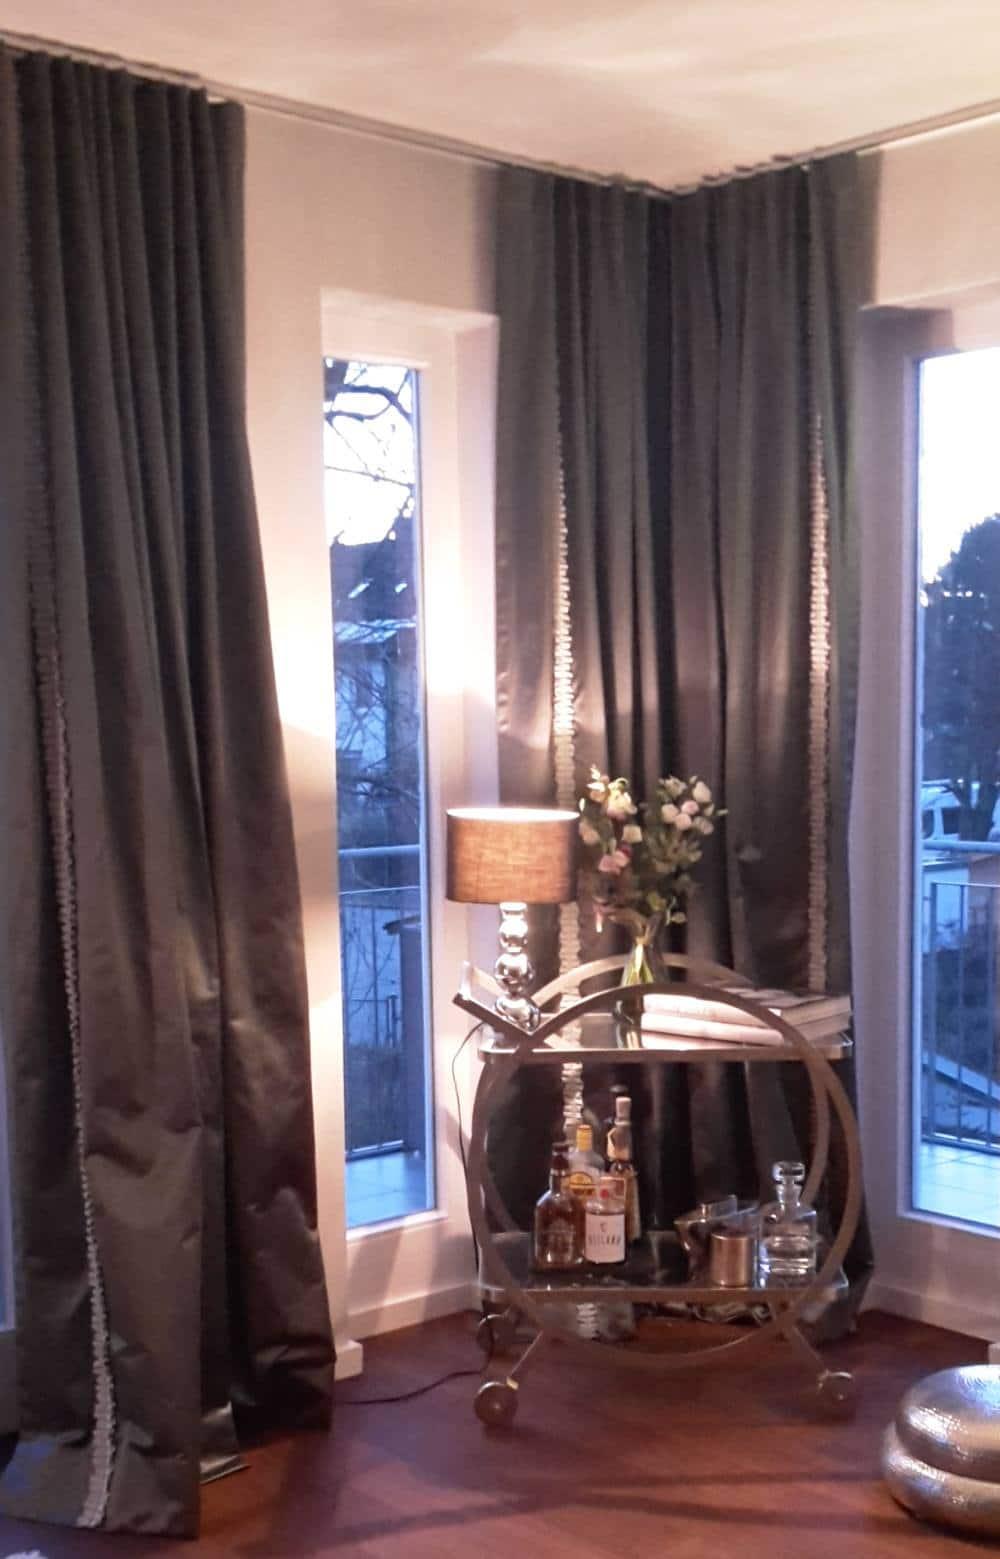 hochwertige vorh nge von nasha ambrosch. Black Bedroom Furniture Sets. Home Design Ideas